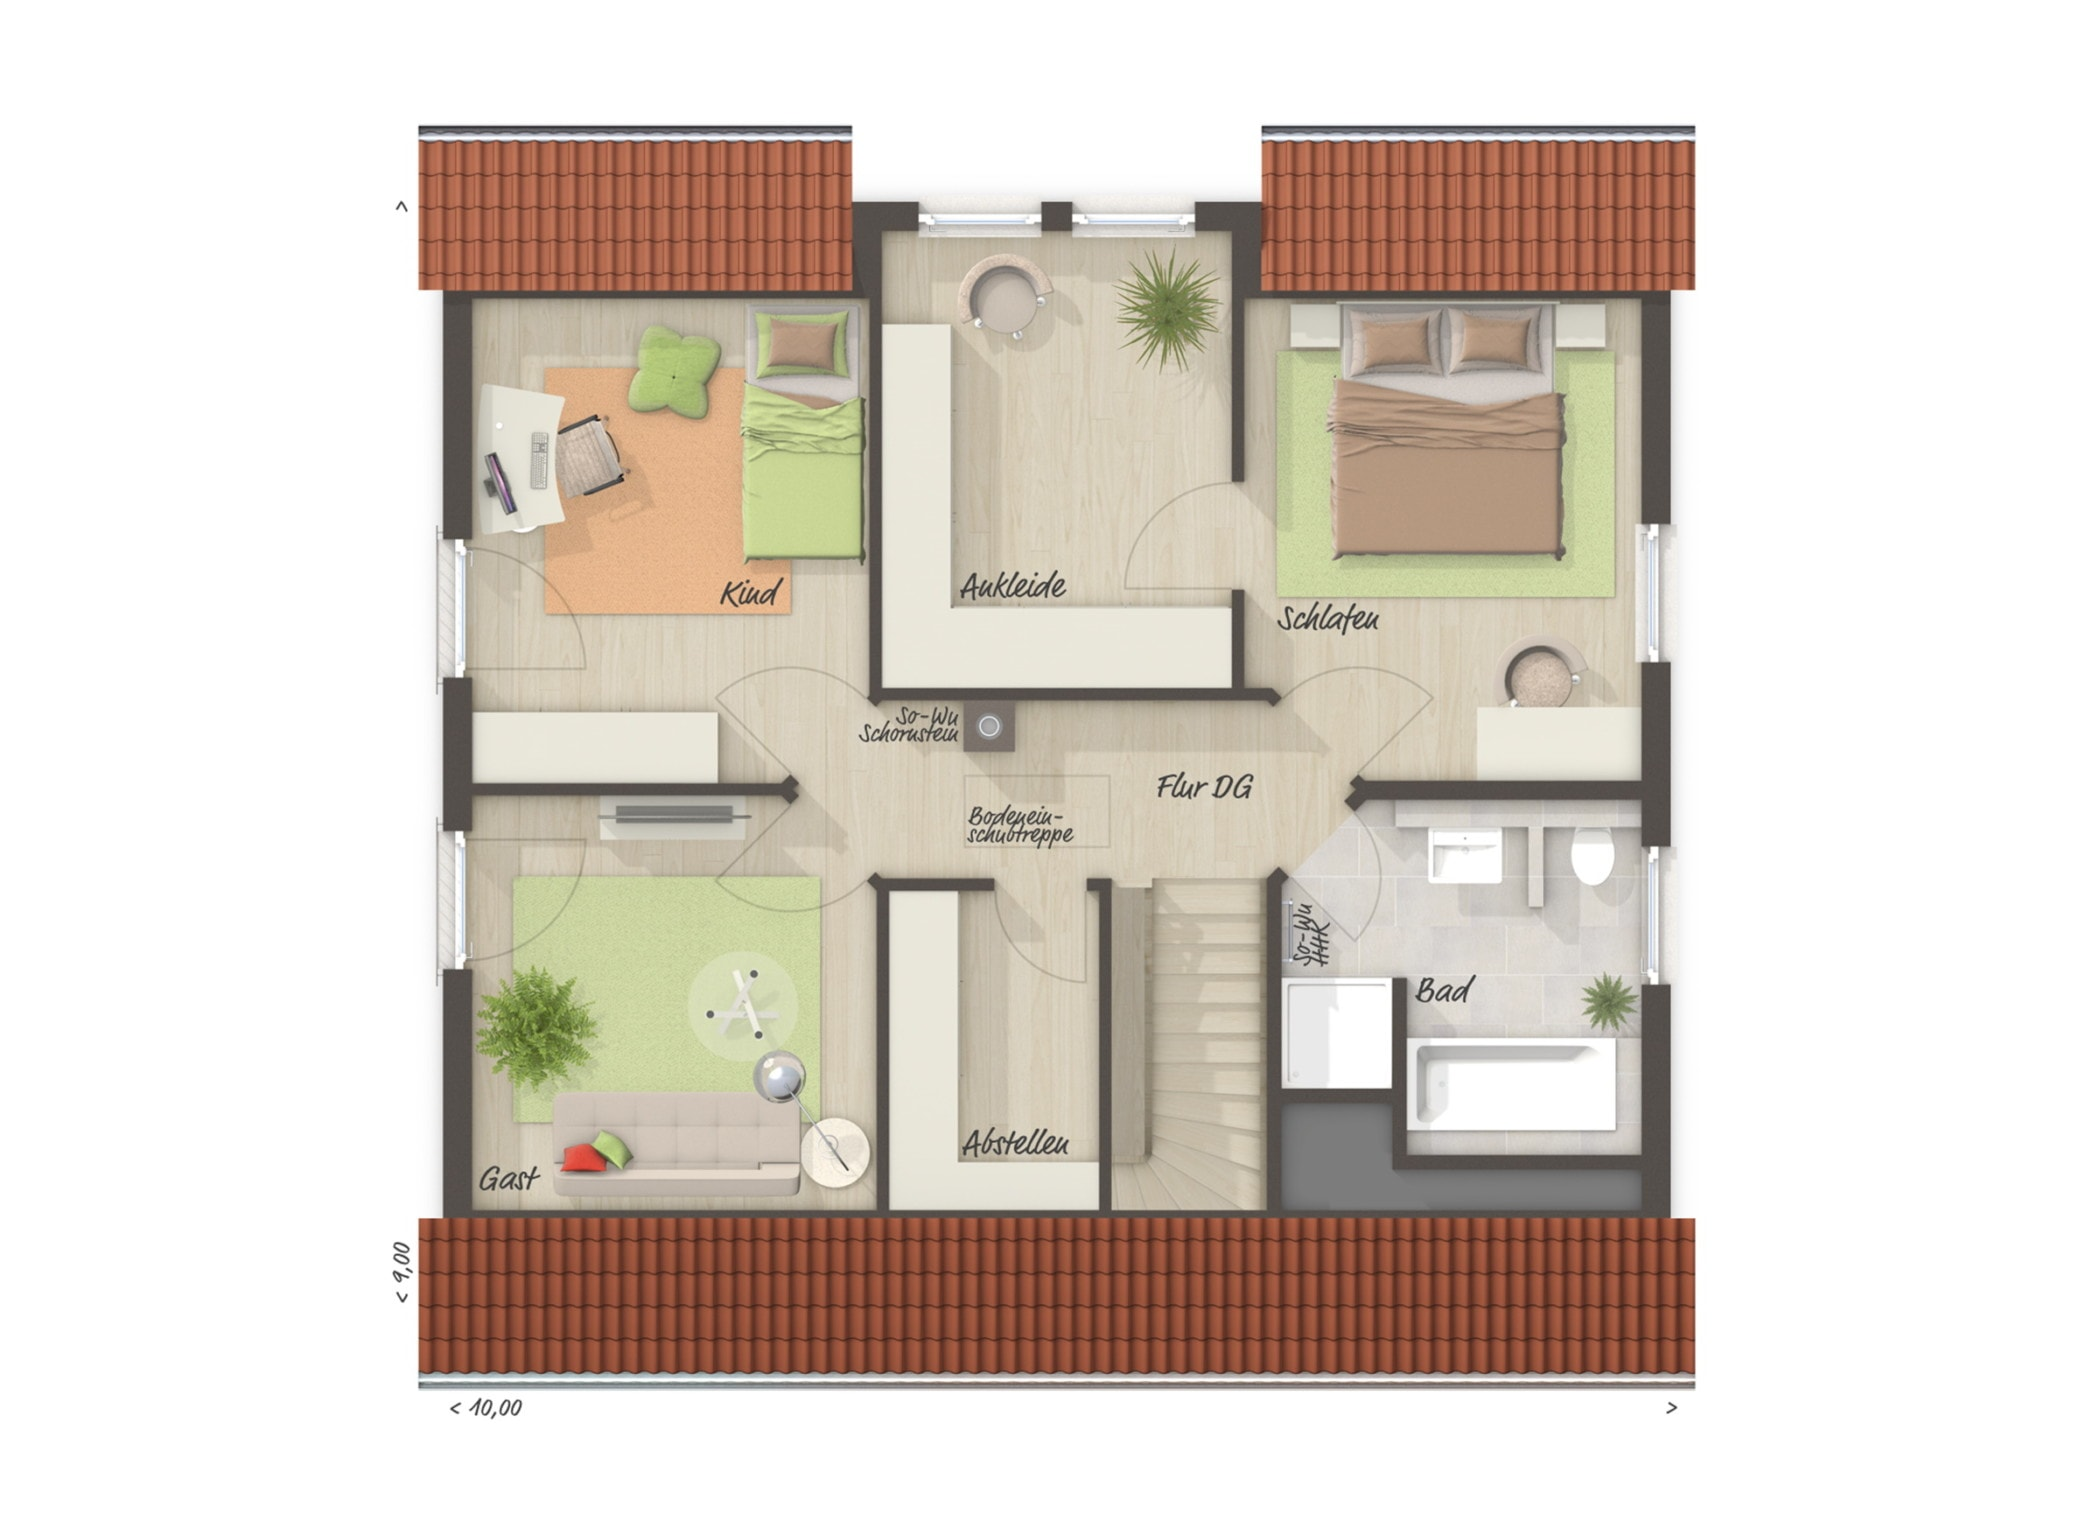 Grundriss Einfamilienhaus Obergeschoss mit Satteldach, 2 Kinderzimmer & Ankleide, 6 Zimmer, 130 qm - Massivhaus bauen Ideen Town Country Haus FLAIR 134 - HausbauDirekt.de